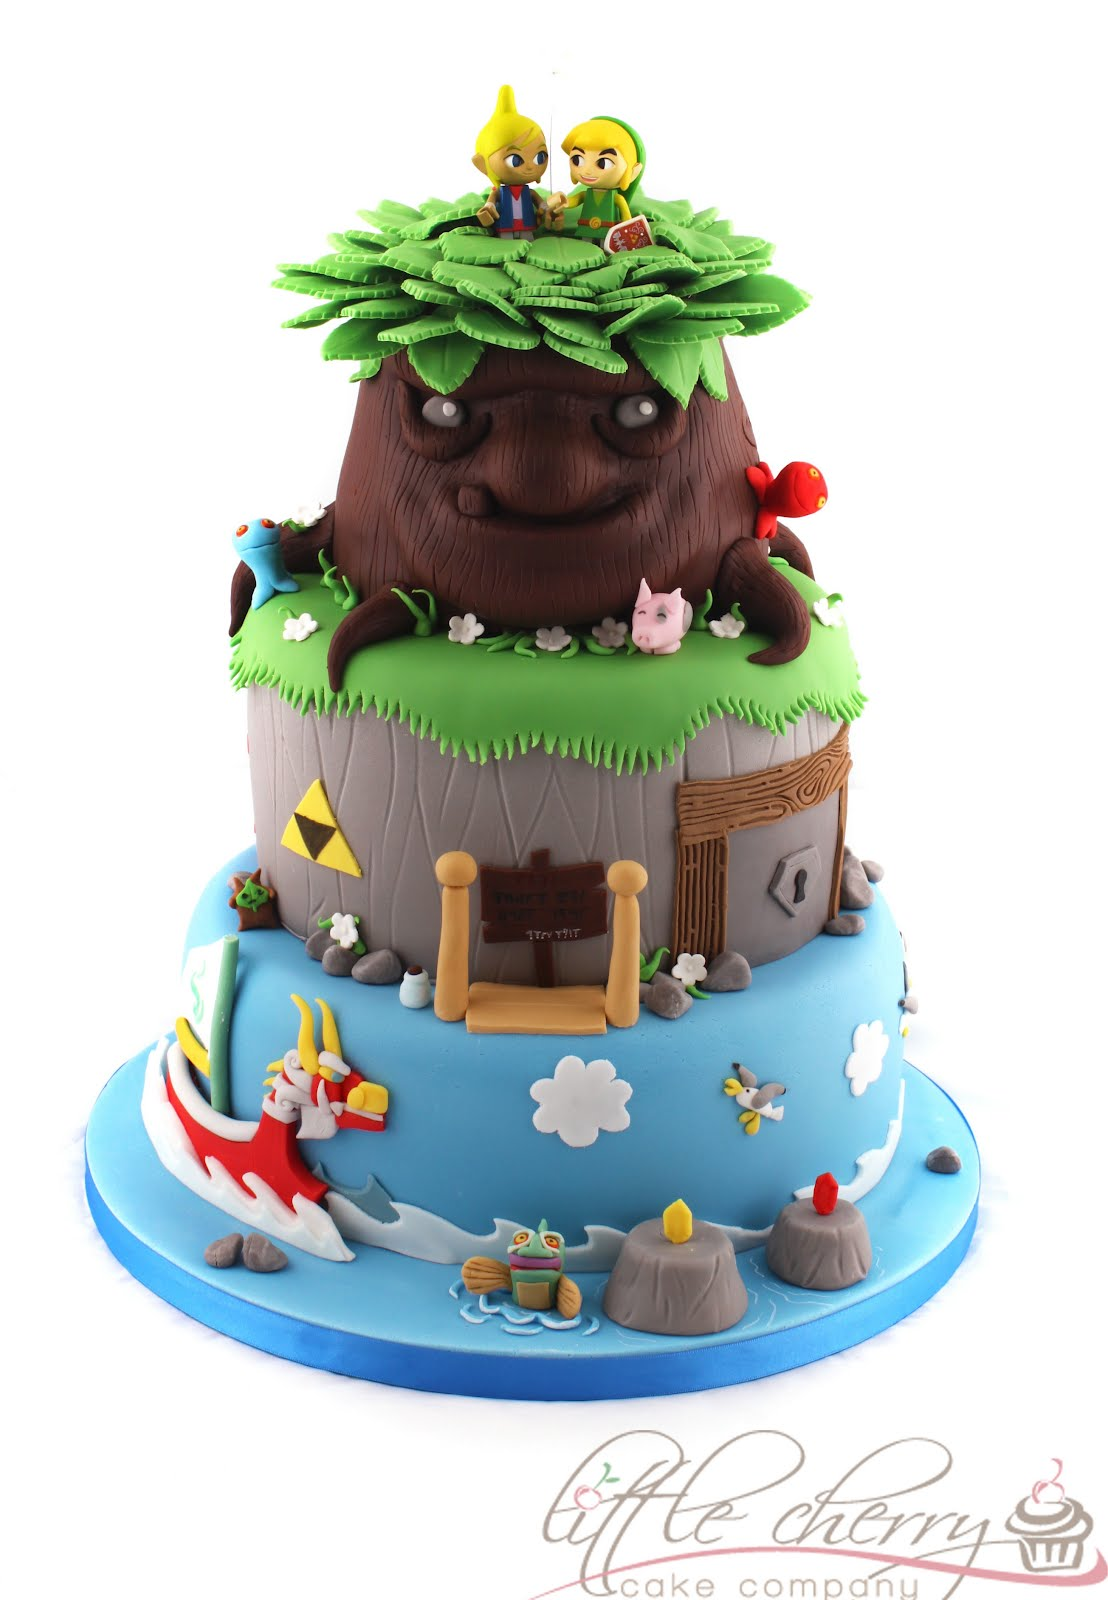 Legend of Zelda: The Wind Walker cake